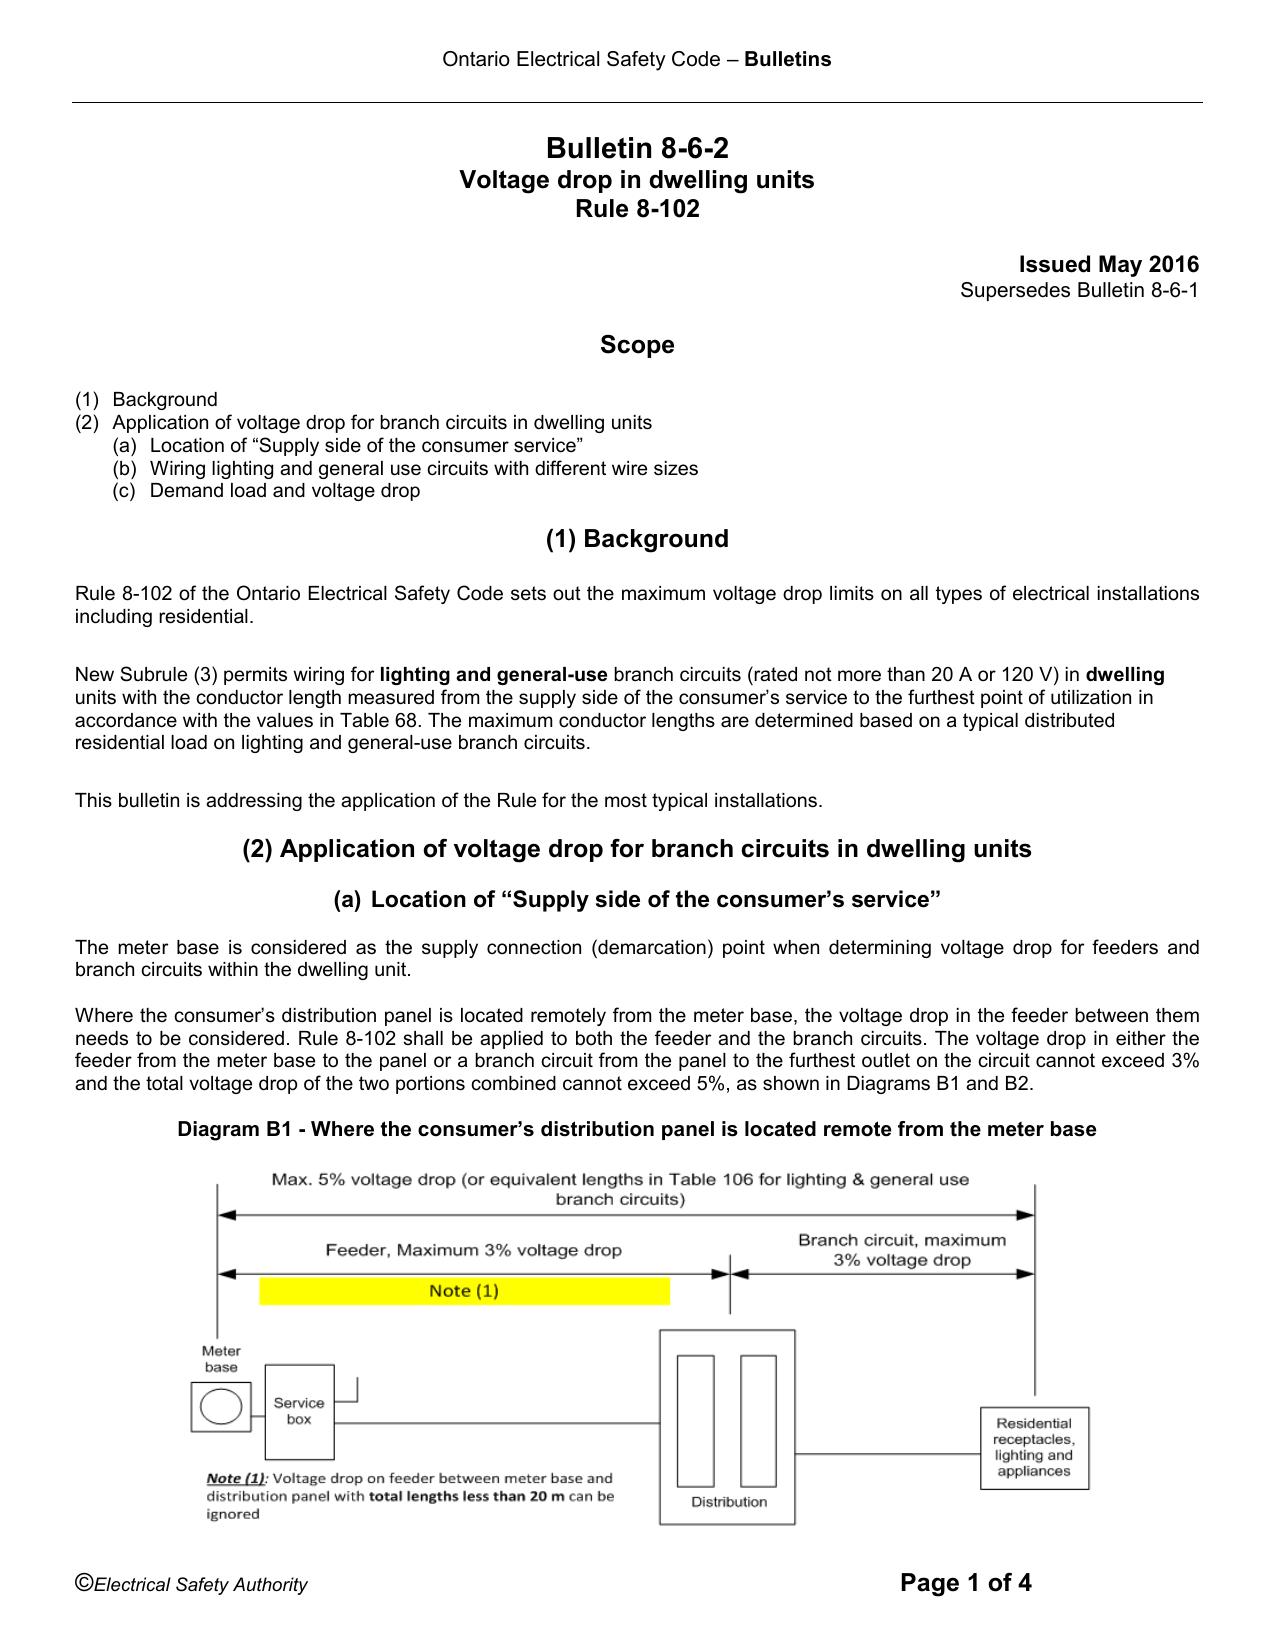 8 6 Voltage Drop In Dwelling Units Shop Distribution Panel Wiring Diagram